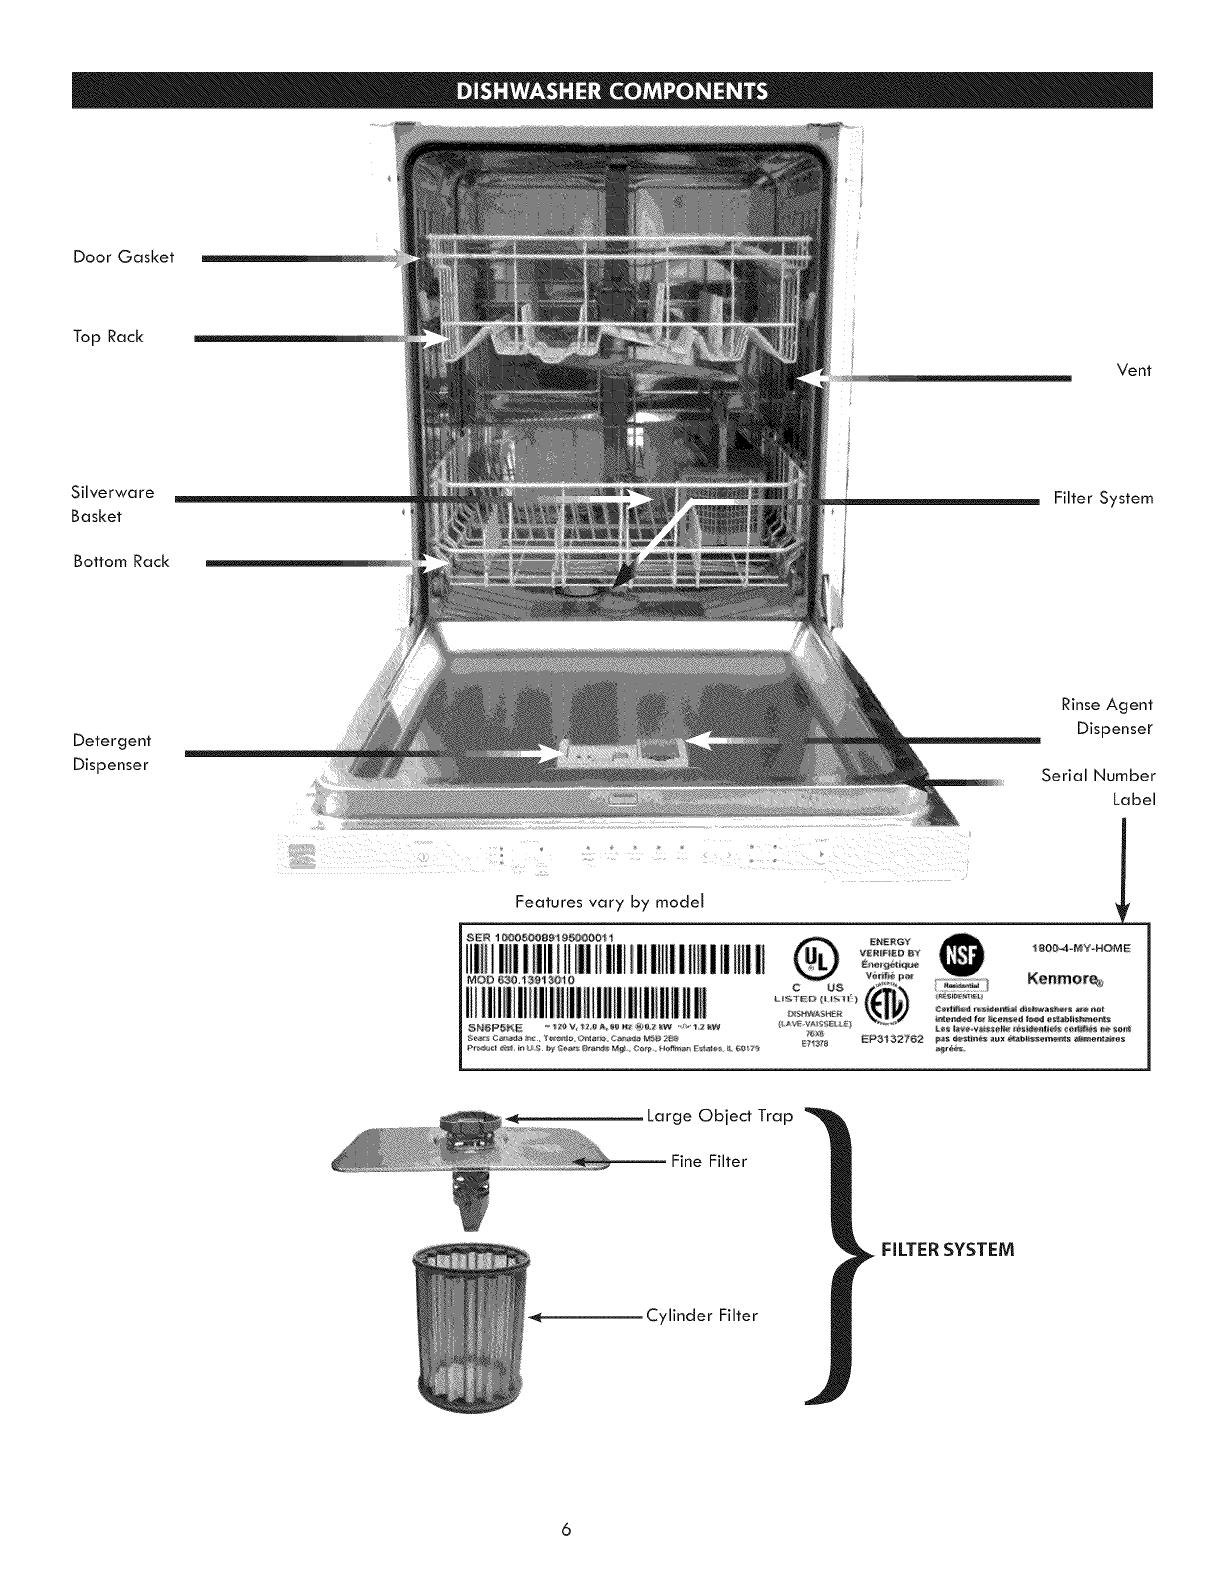 Kenmore Elite 63013903012 User Manual Dishwasher Manuals And Guides Parts Diagram List For Model 59677599802 Kenmoreeliteparts 1007373l